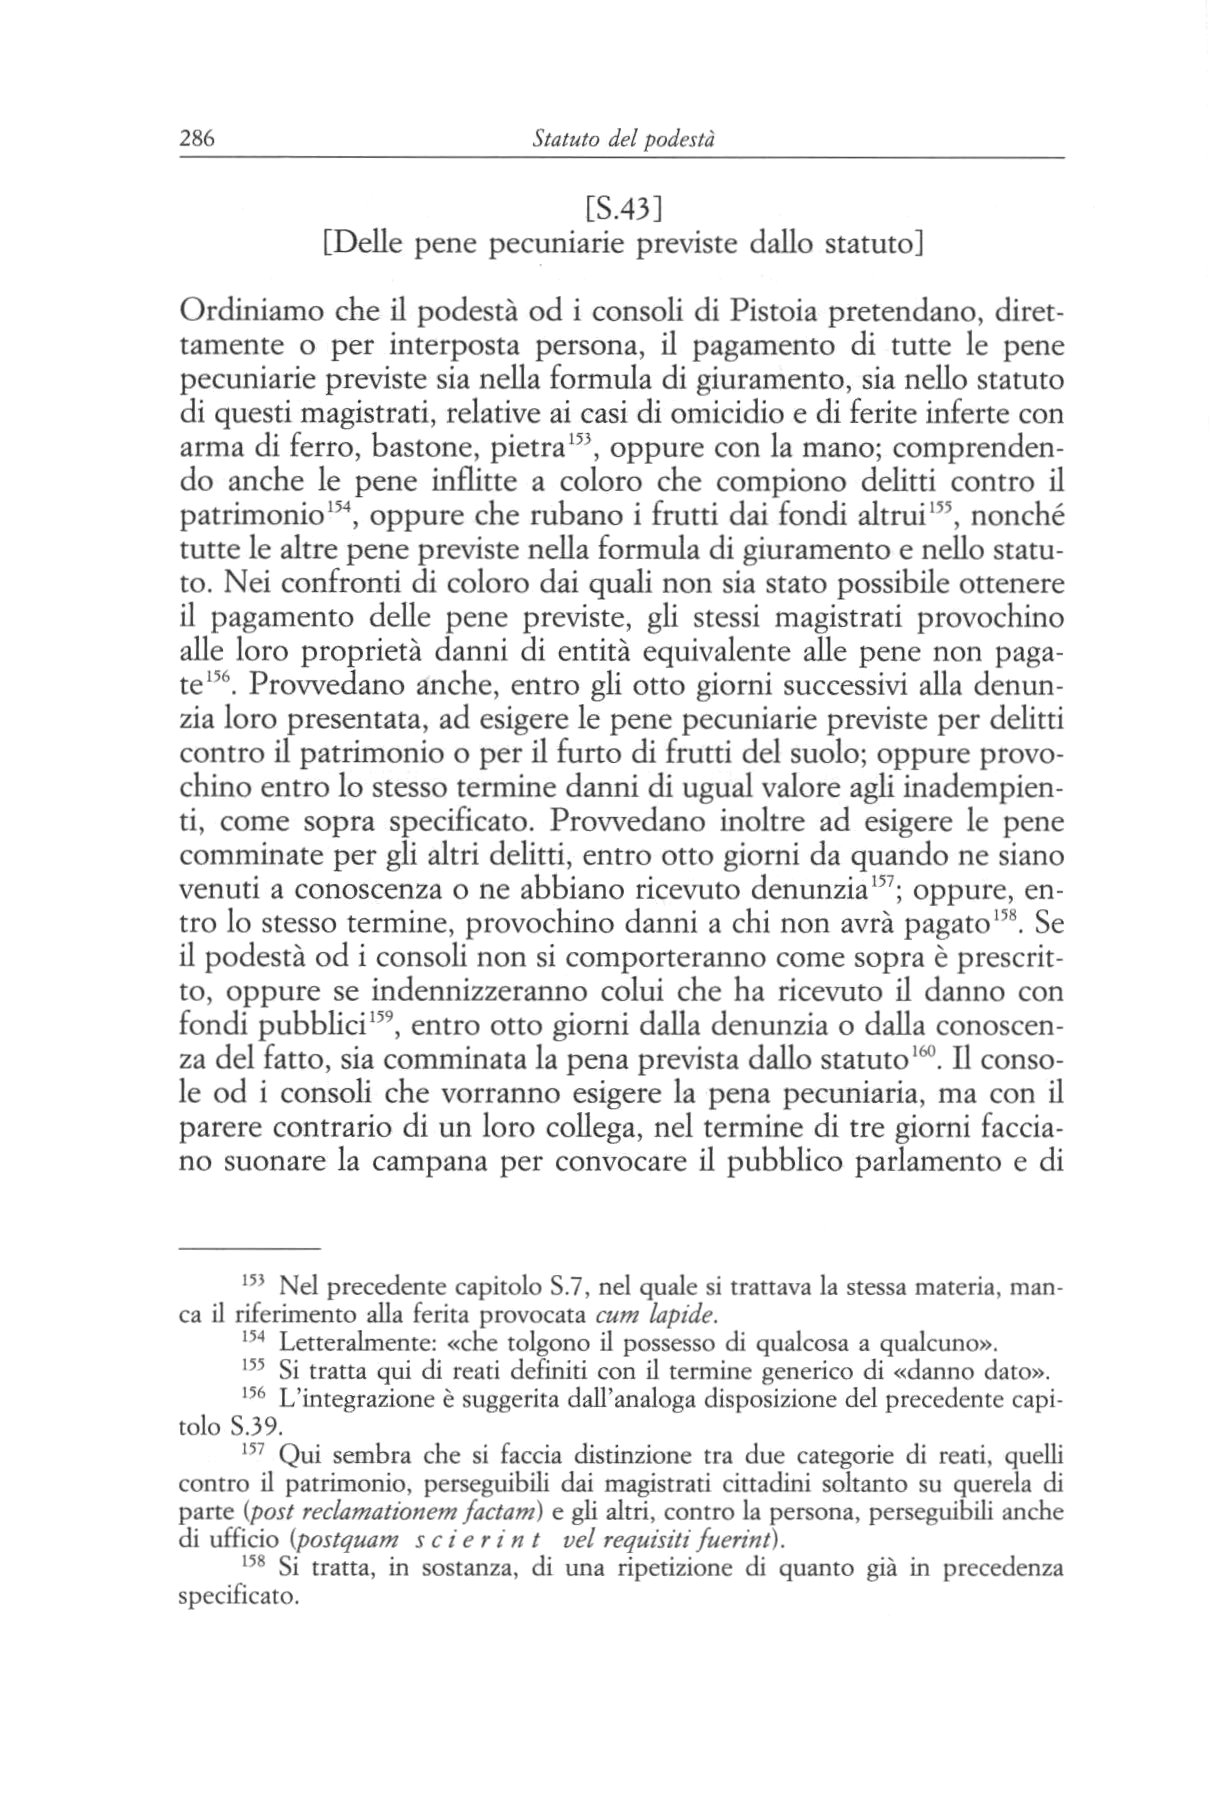 statuti pistoiesi del sec.XII 0286.jpg